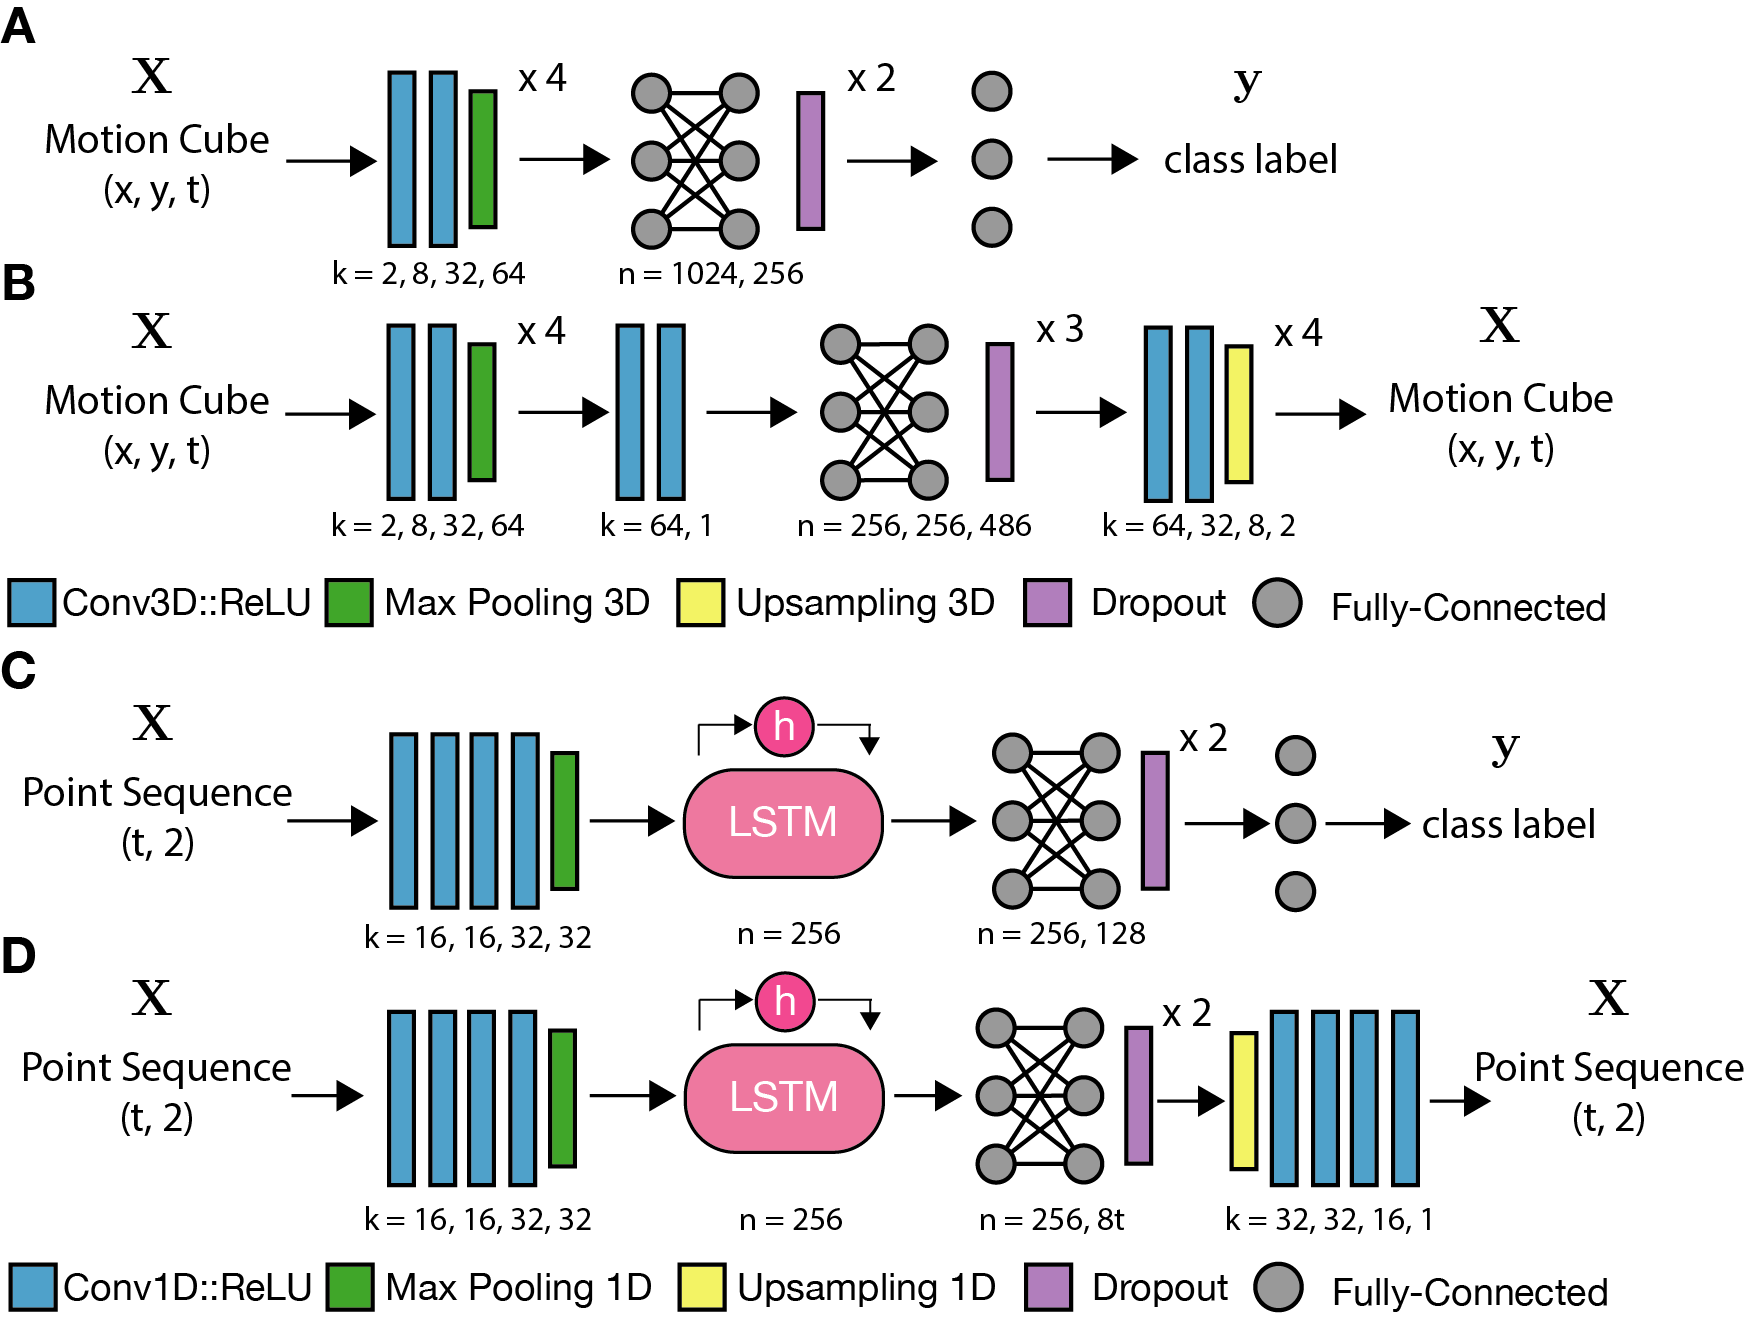 (A) 3D CNN classification and (B) autoencoder architecture. (C) RNN classification and (D) autoencoder architecture.